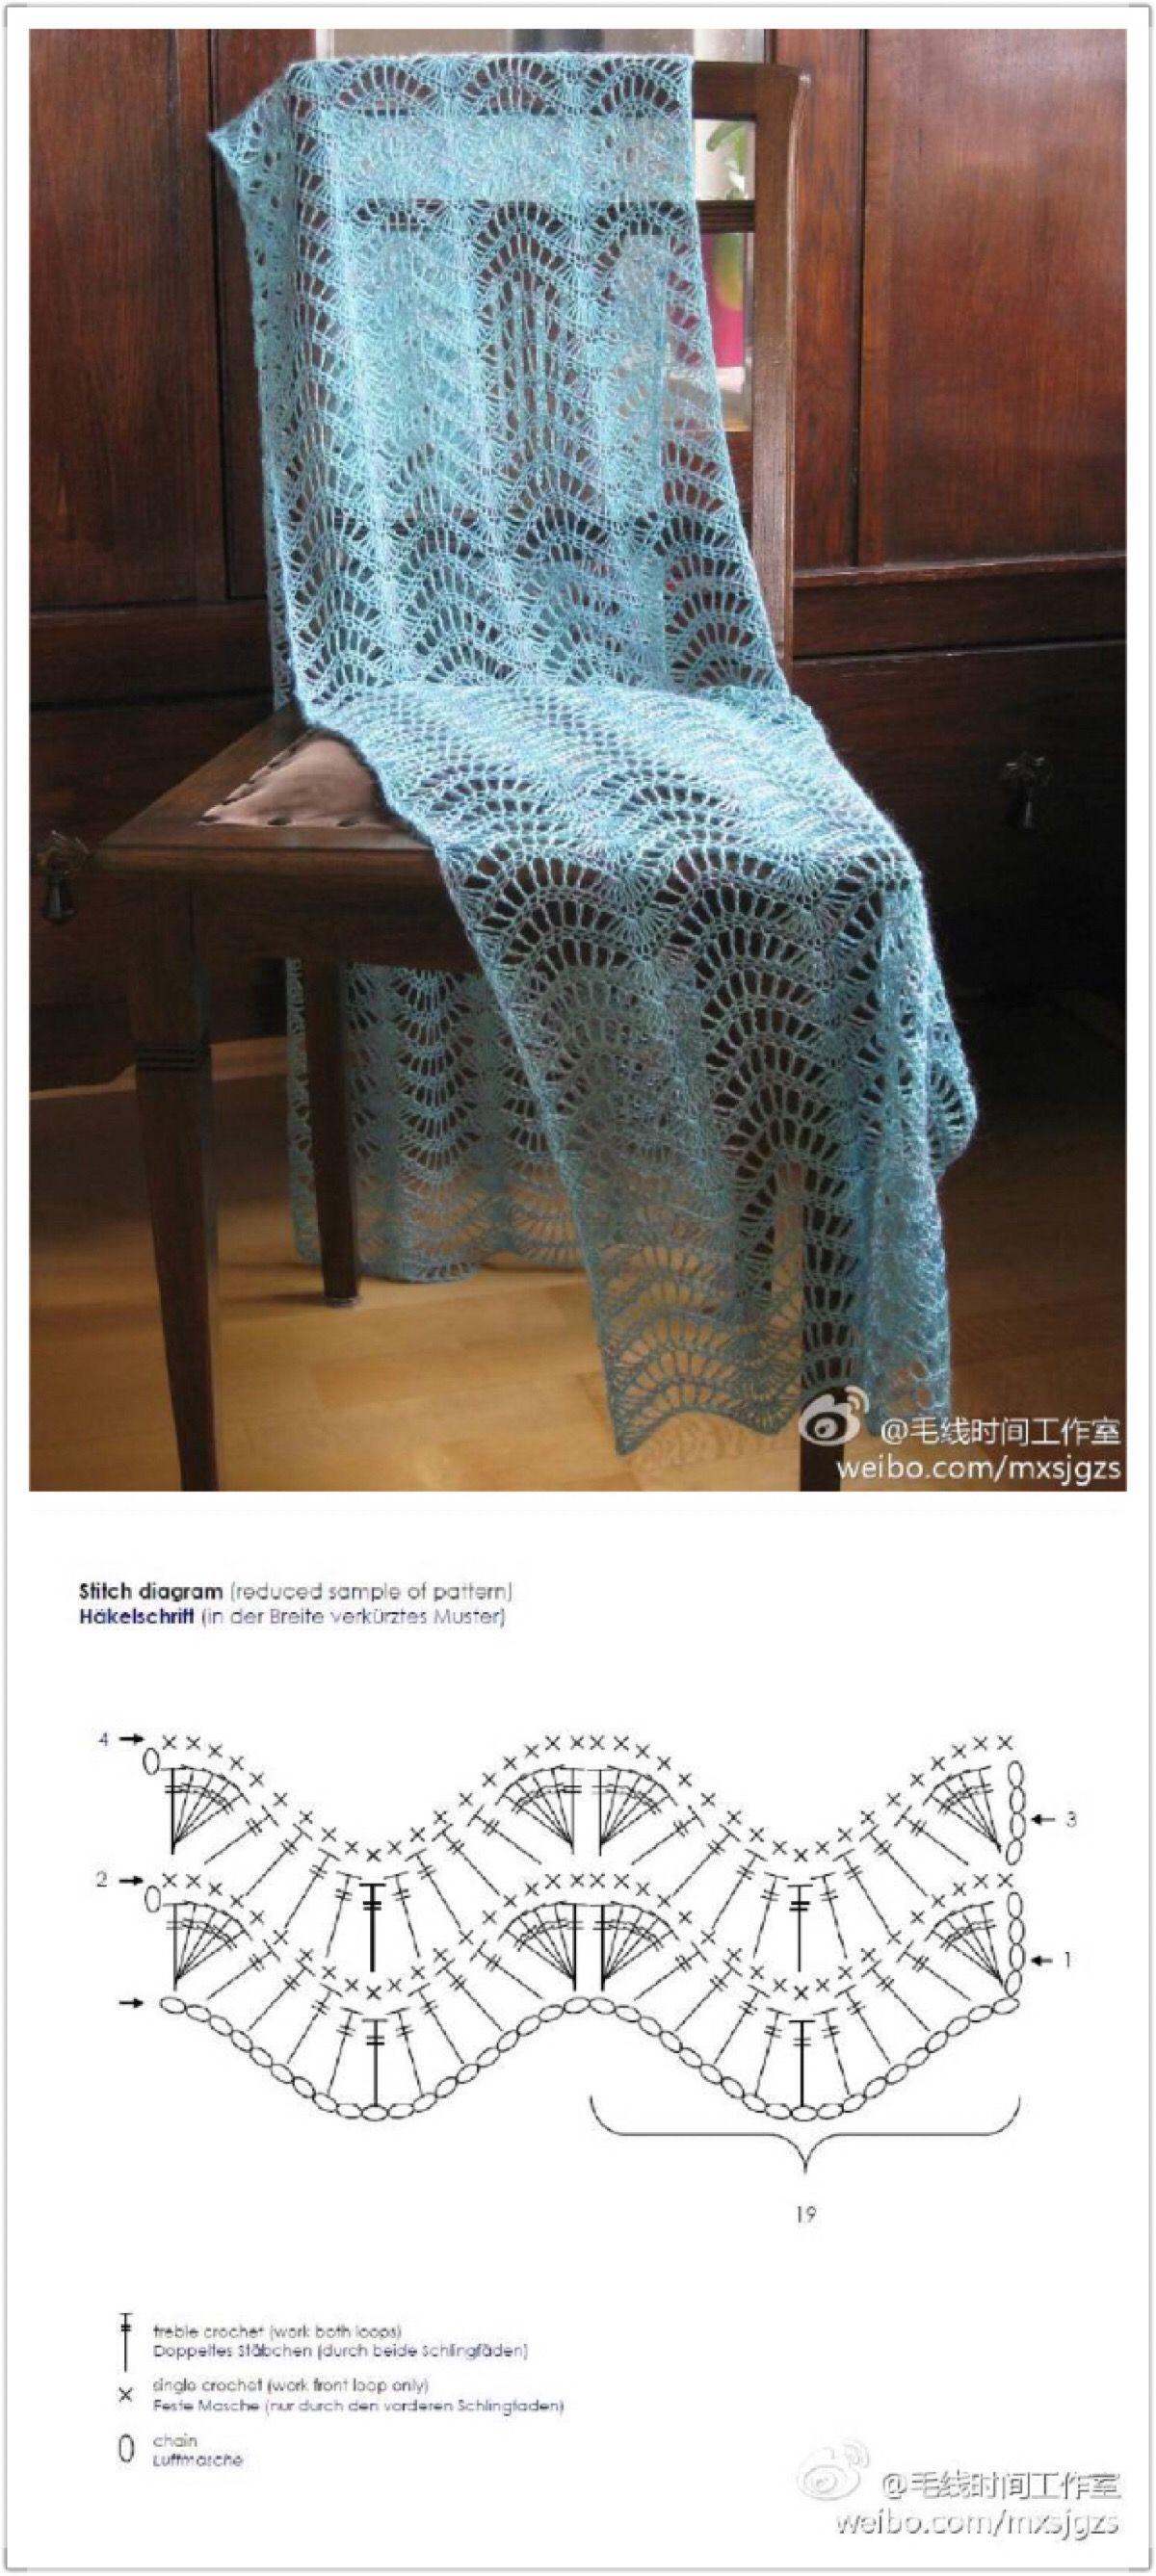 Pin de Susana Dzuiba en crochet | Pinterest | Chal, Ganchillo y Espejo